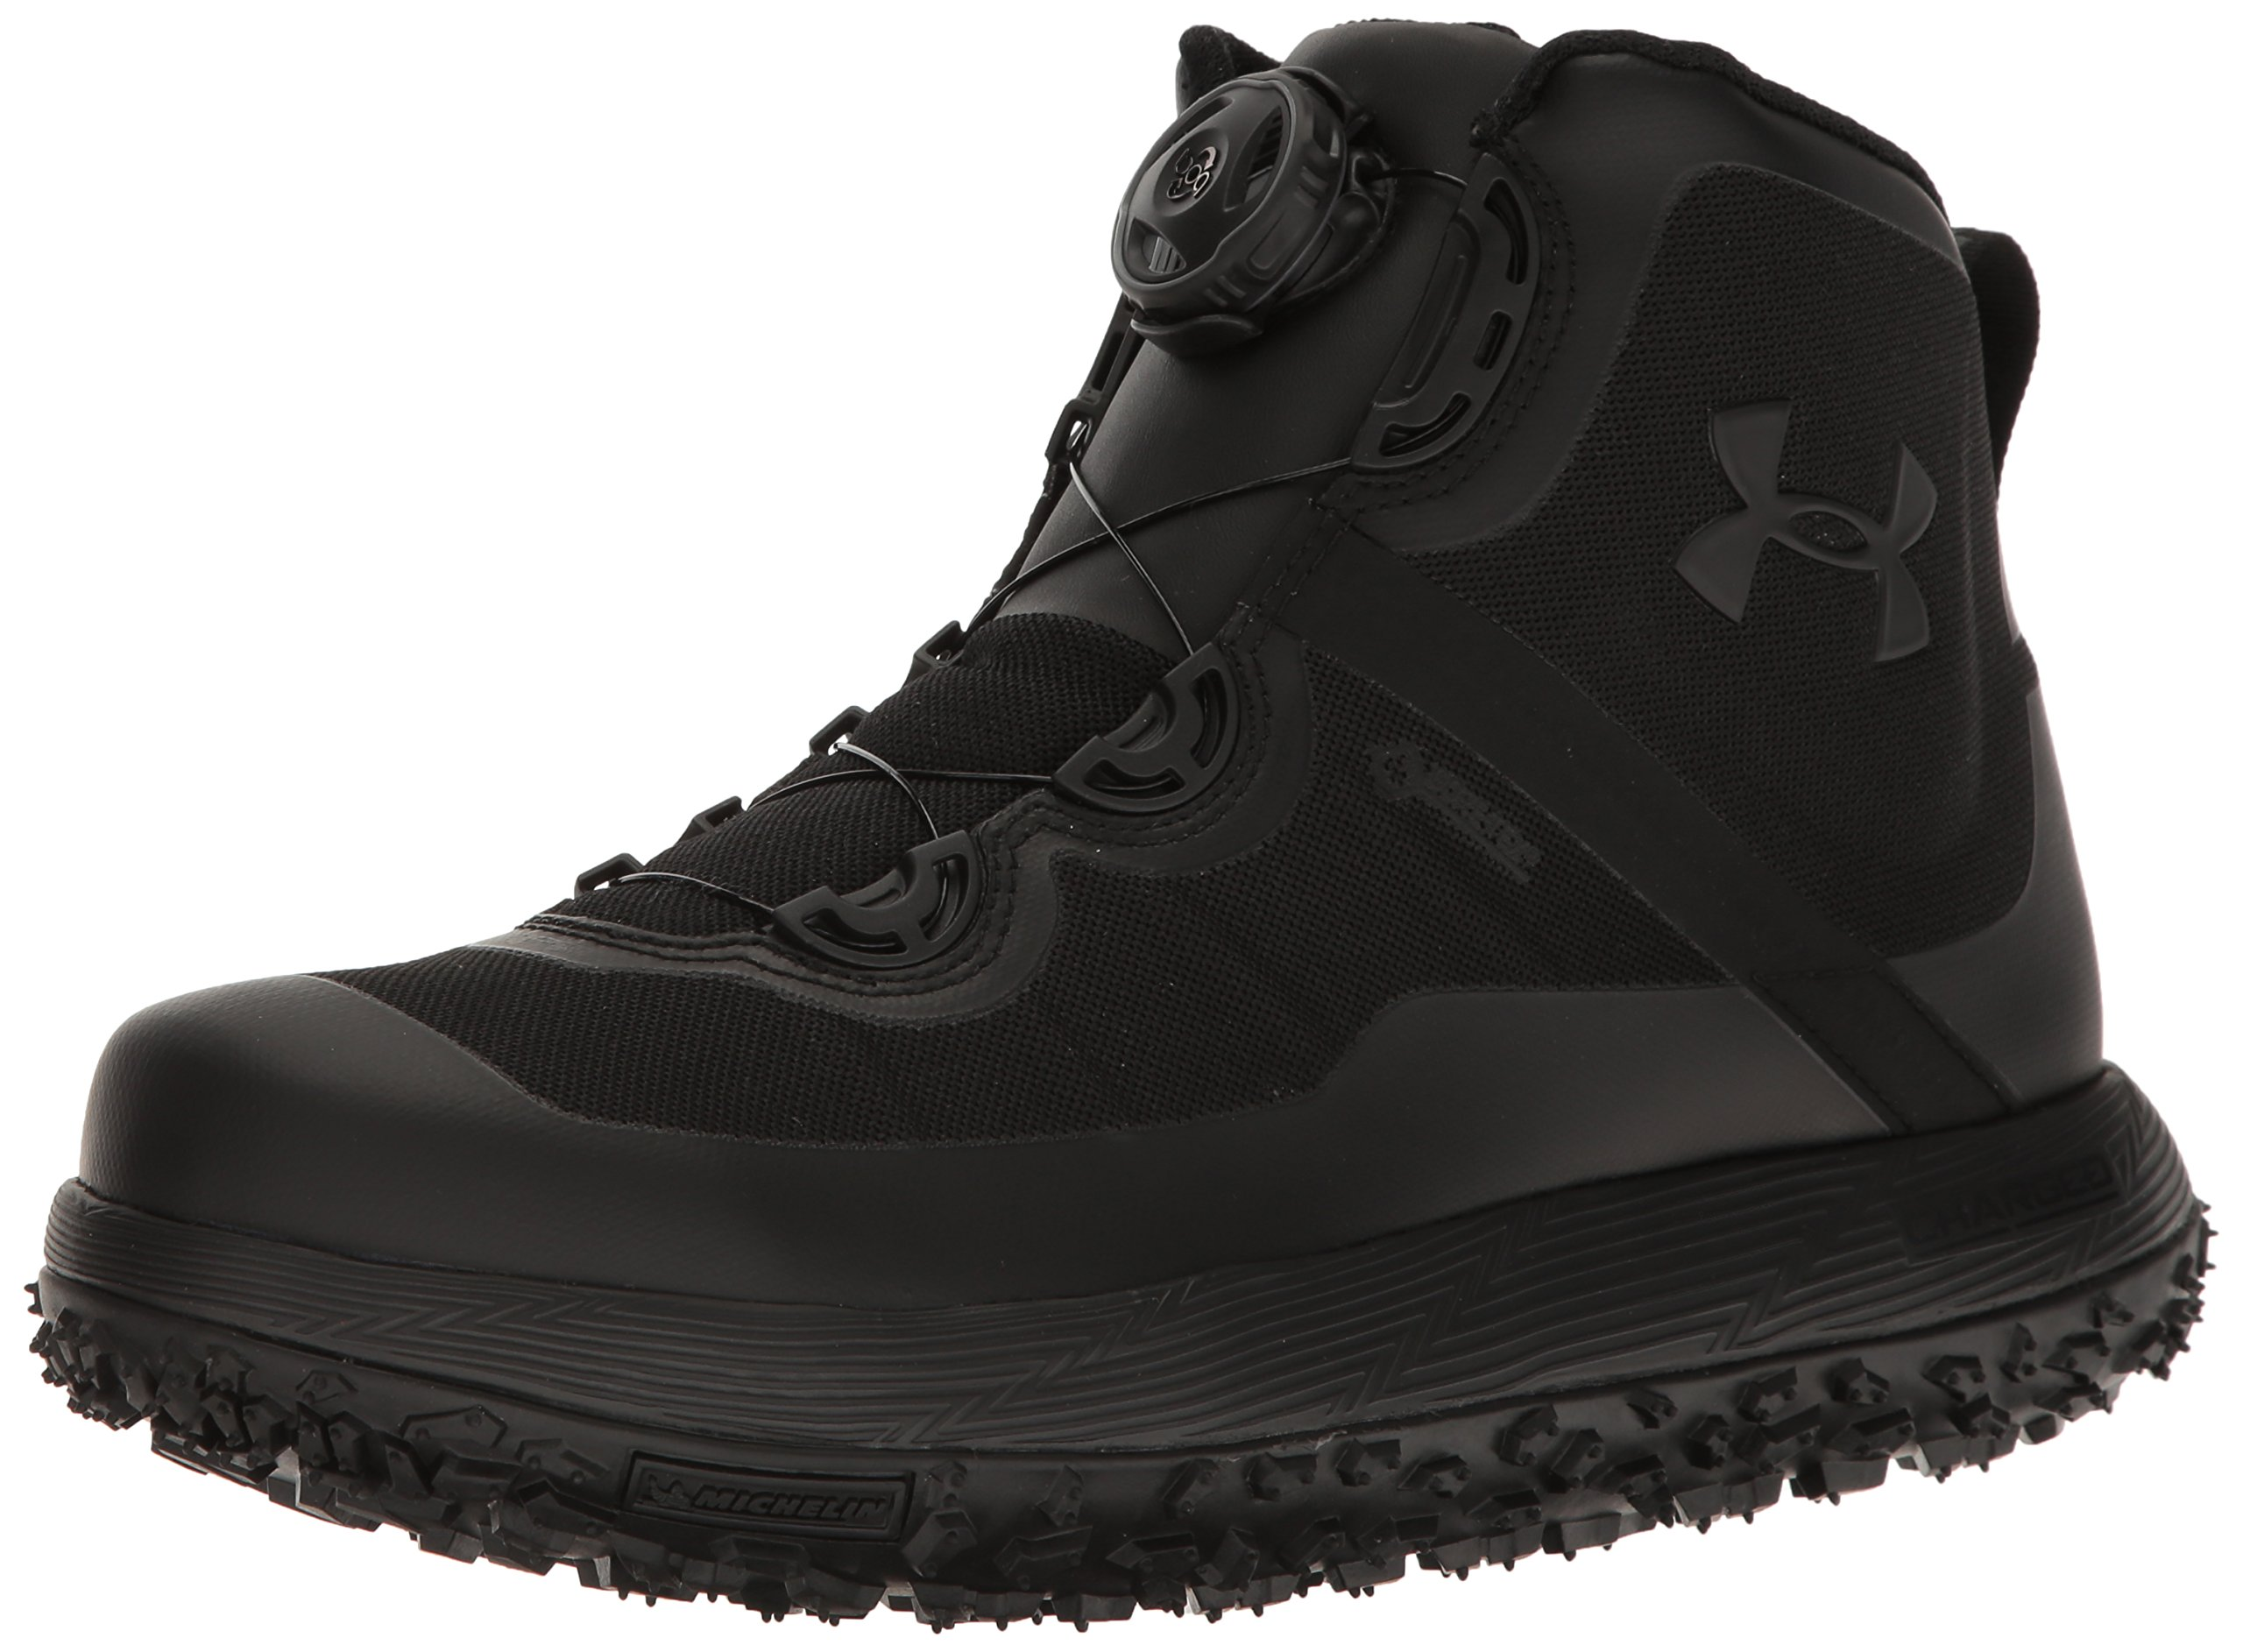 Under Armour Men's Fat Tire GORE-TEX, Black (001)/Black, 11